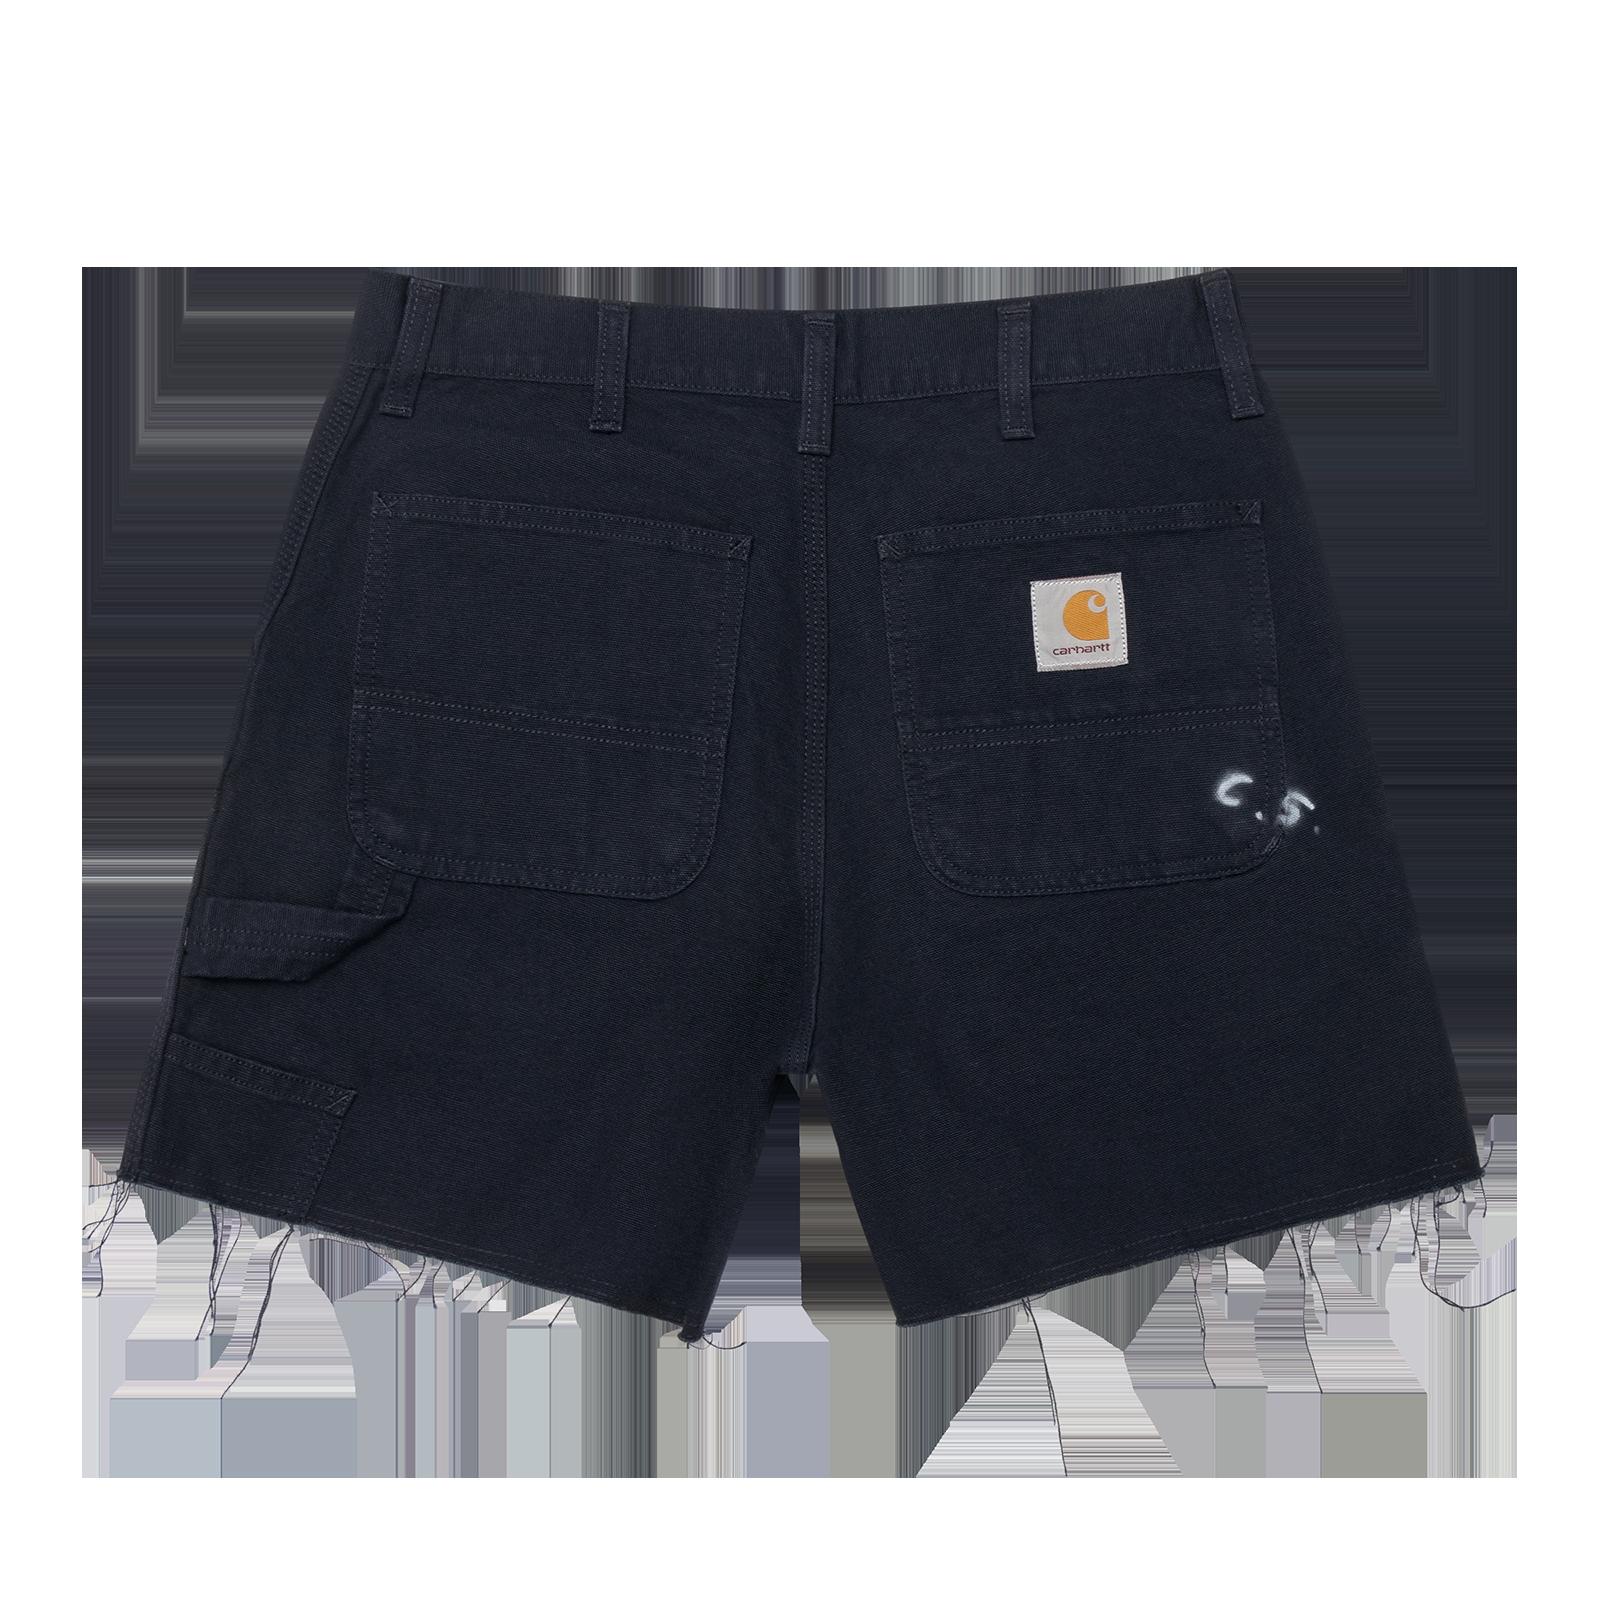 Flat lay shorts product photo